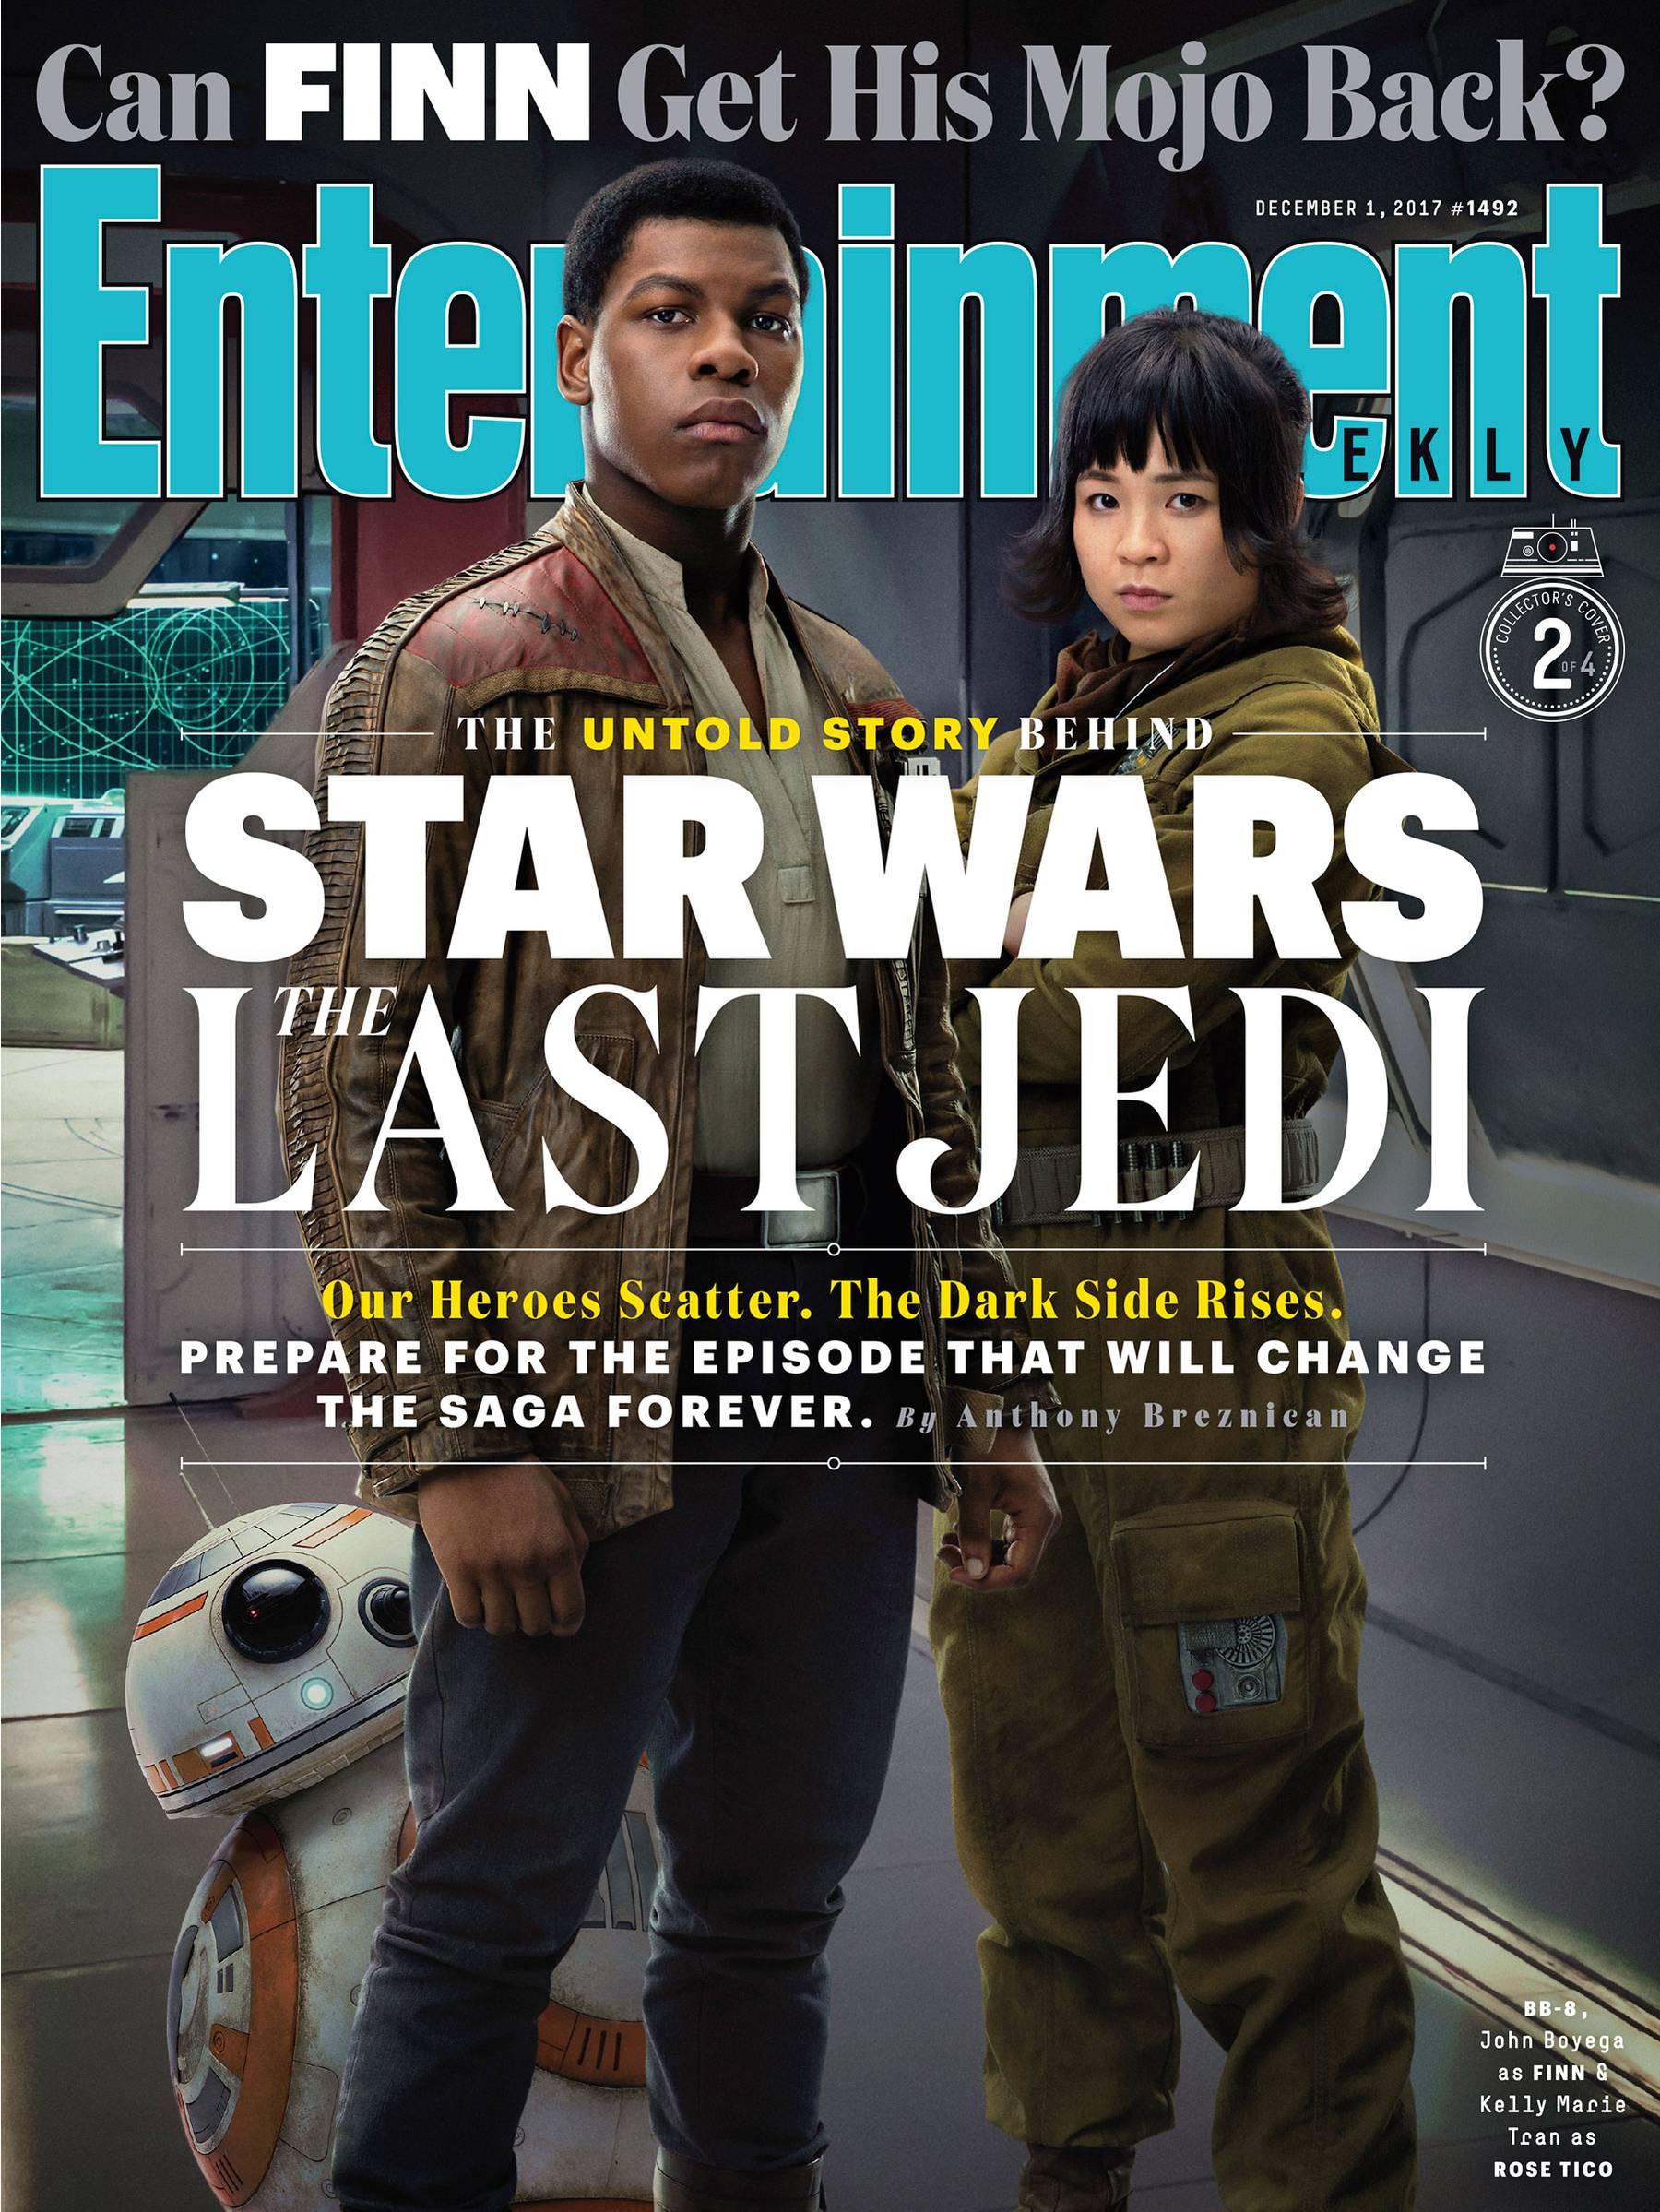 Звёздные войны: Последние джедаи, кадр № 21